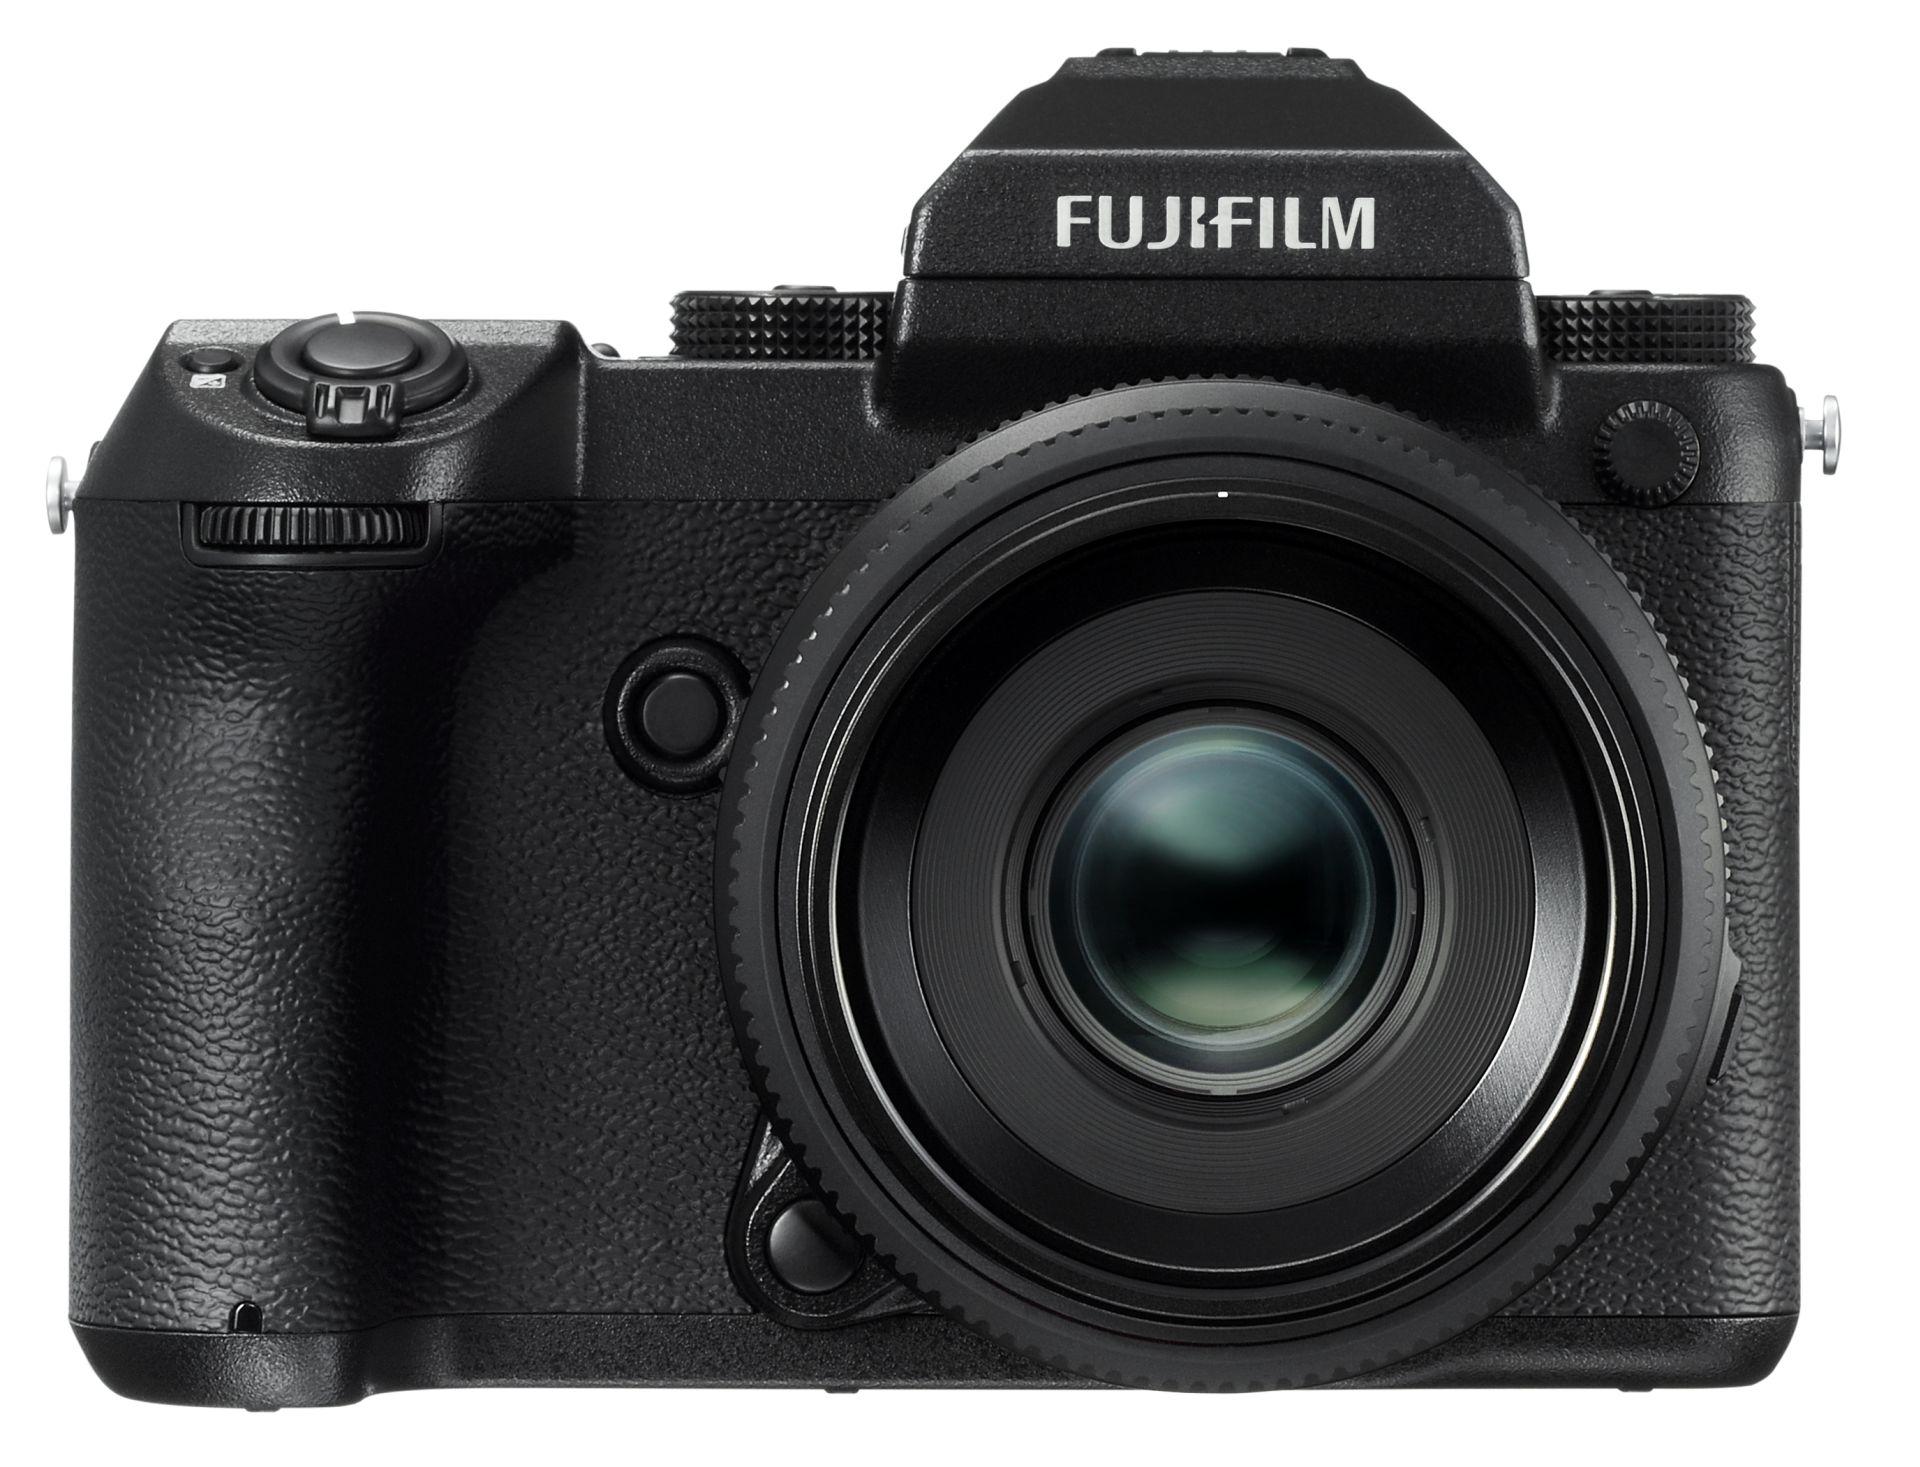 Fujifilm überspringt das Vollformat - die Mittelformatkamera GFX 50S ...